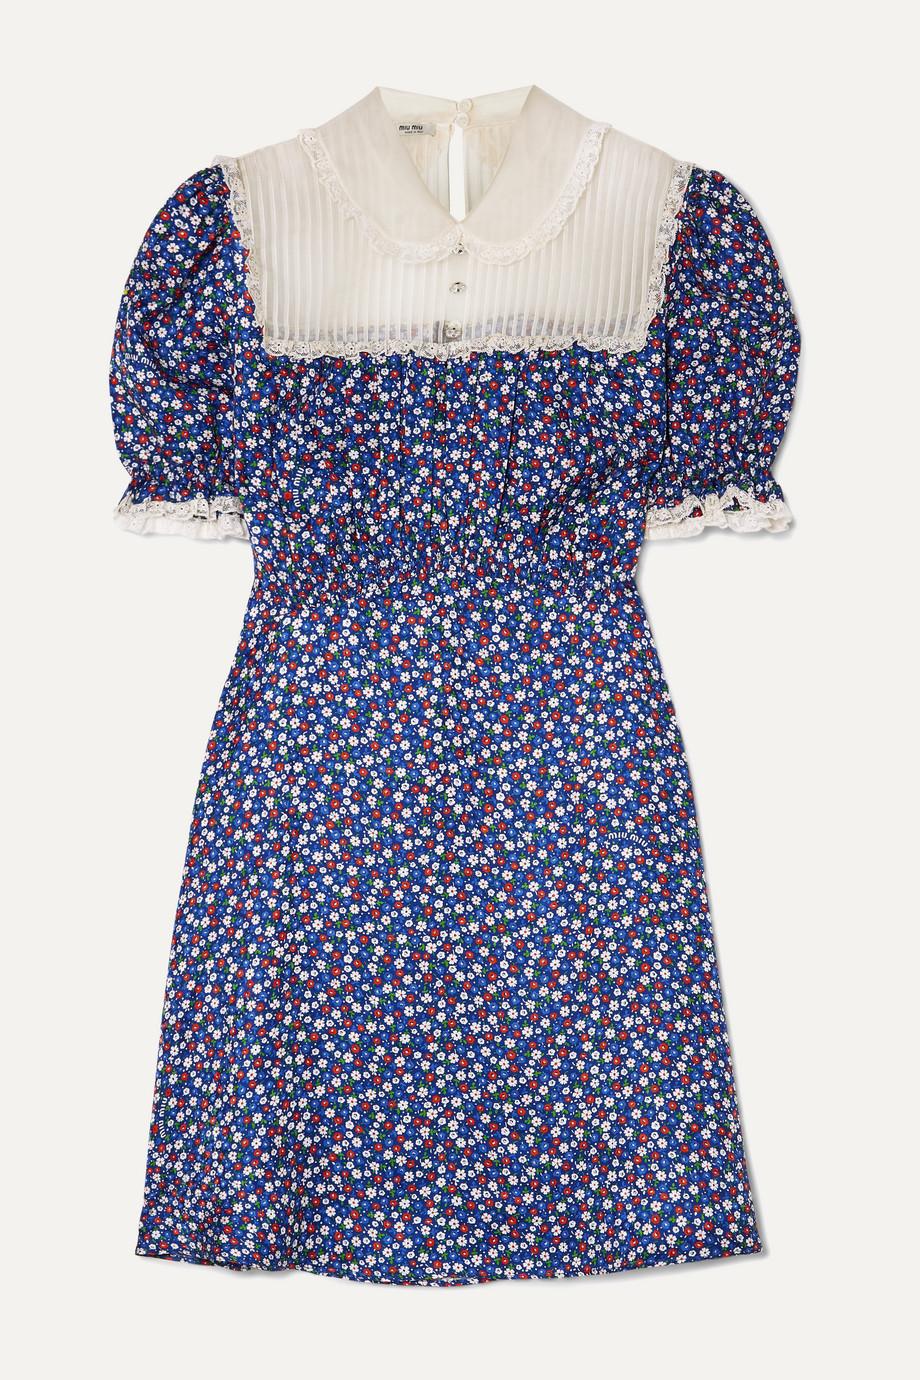 Miu Miu Lace-trimmed floral-print silk-satin and silk-georgette mini dress